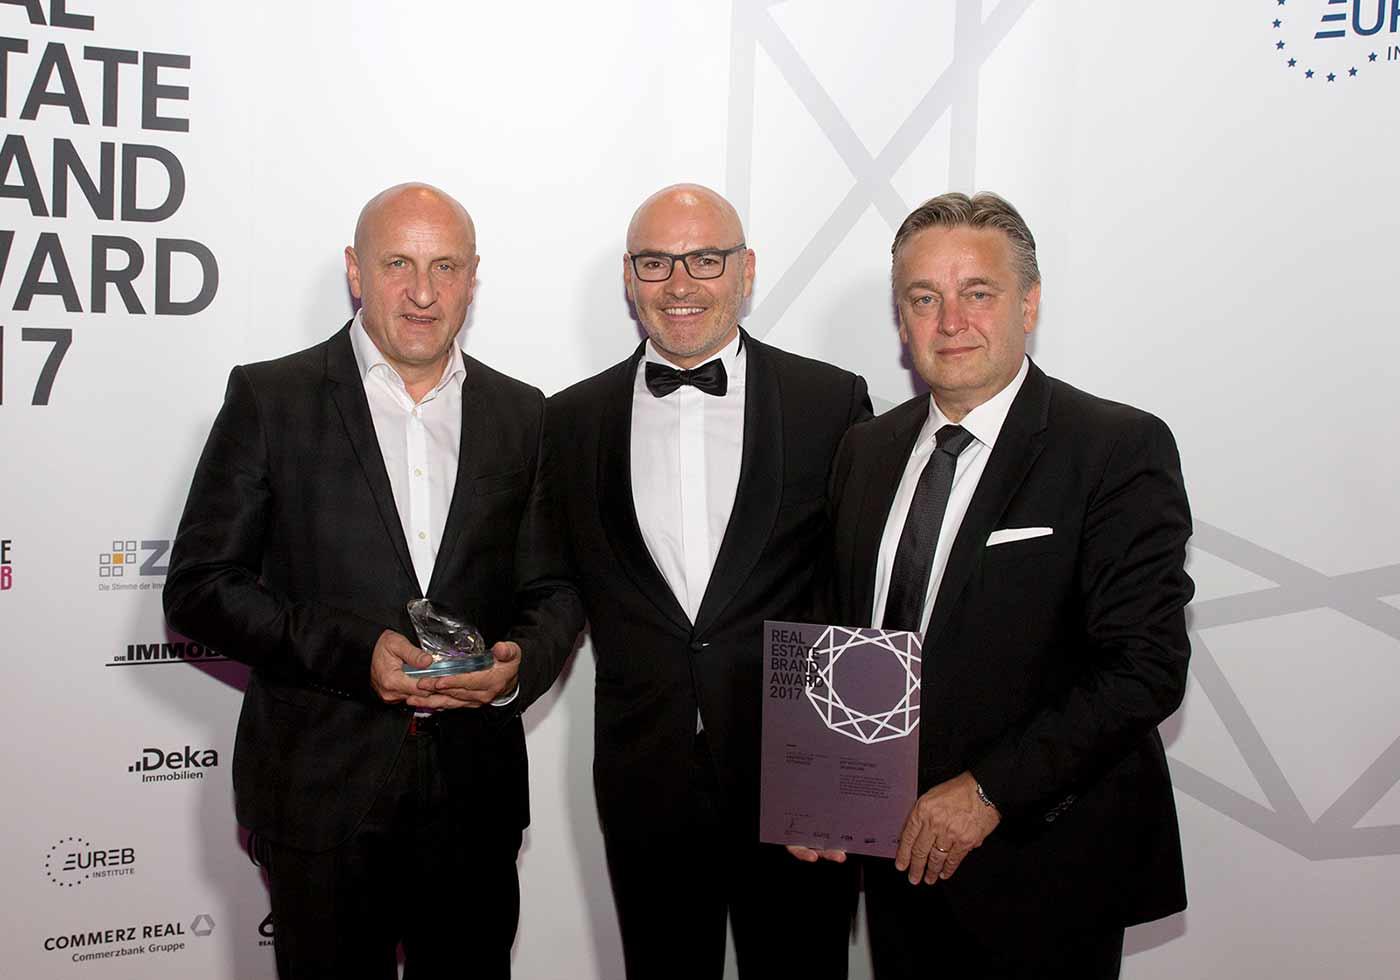 Brand Award – три победы подряд